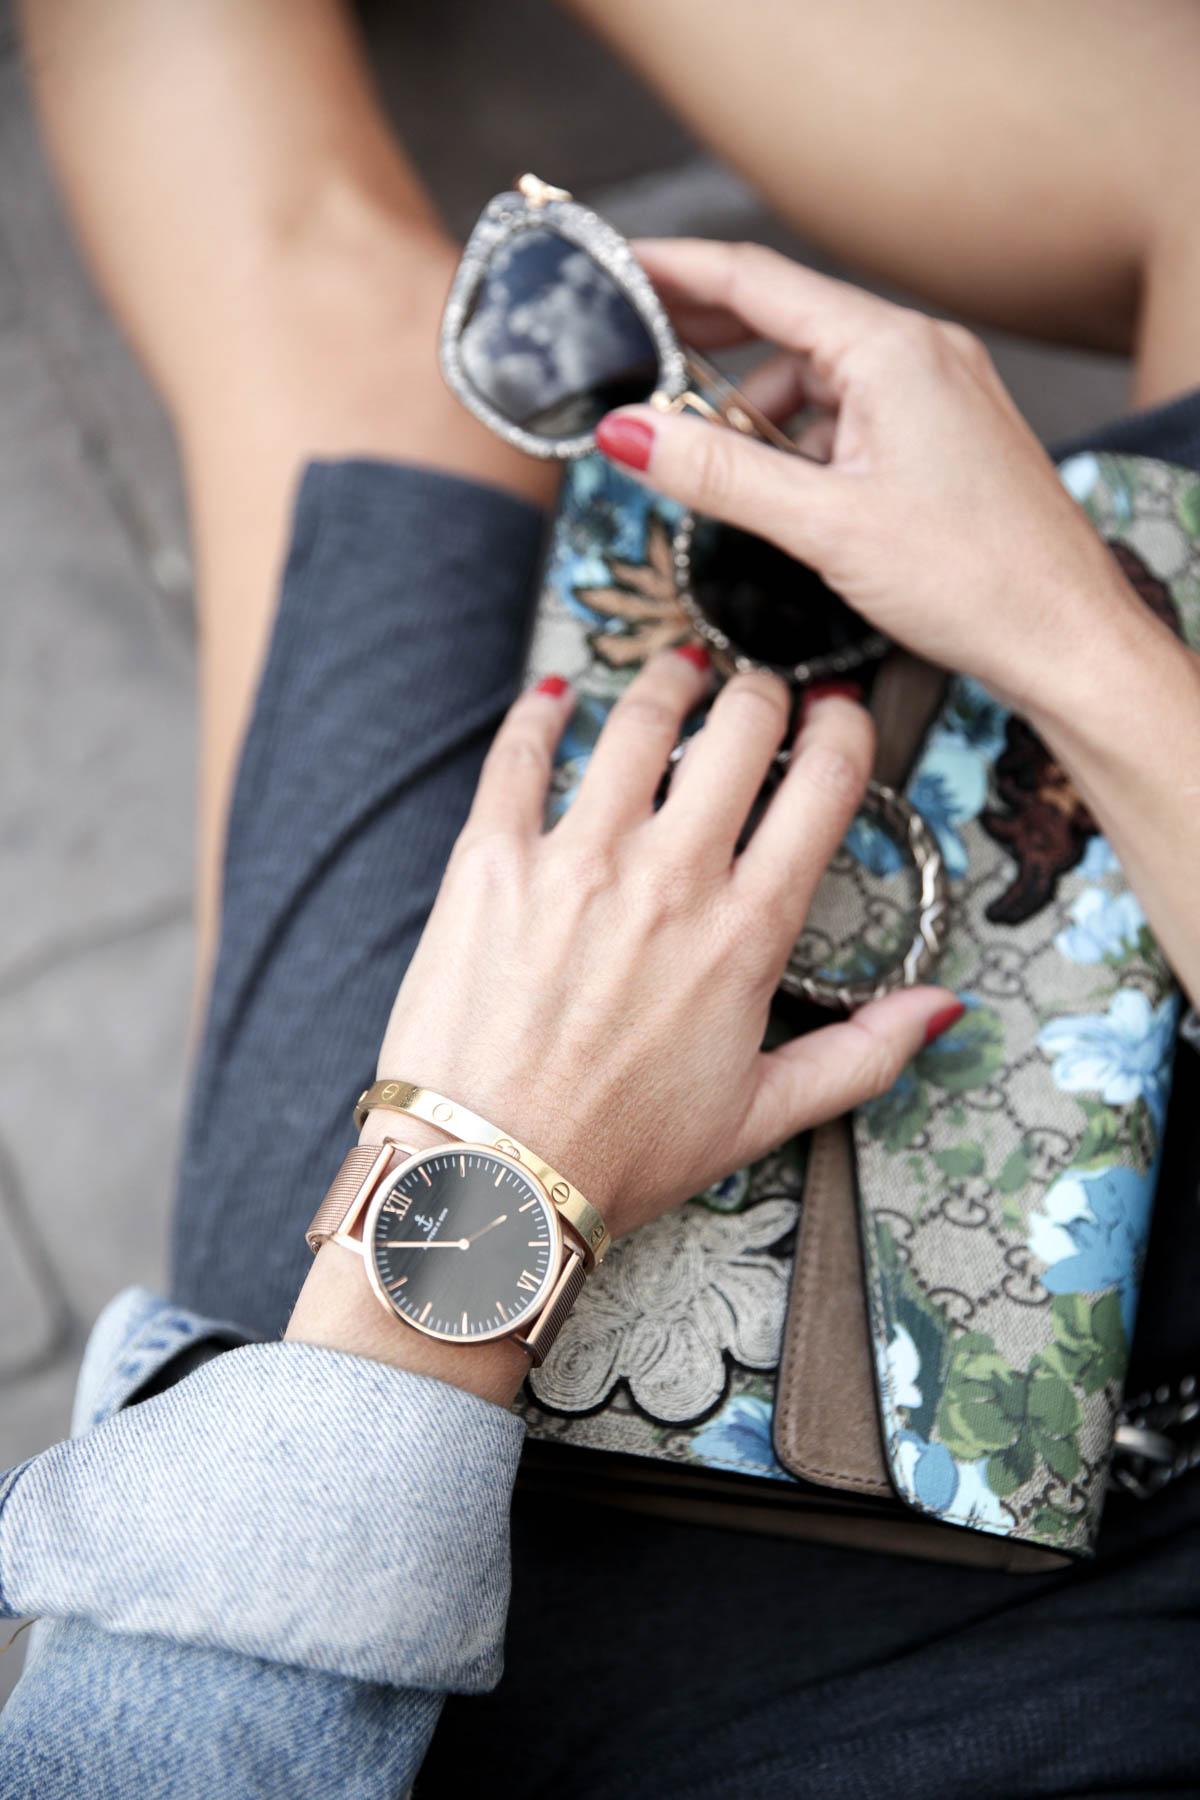 black-friday-a-bicyclette-sweatshirt-hoodie-all-star-leather-piel-cuero-celine-bag-bolso-mini-skirt-falda-streetstyle-look-bartabac-outfit-moda-blogger-21